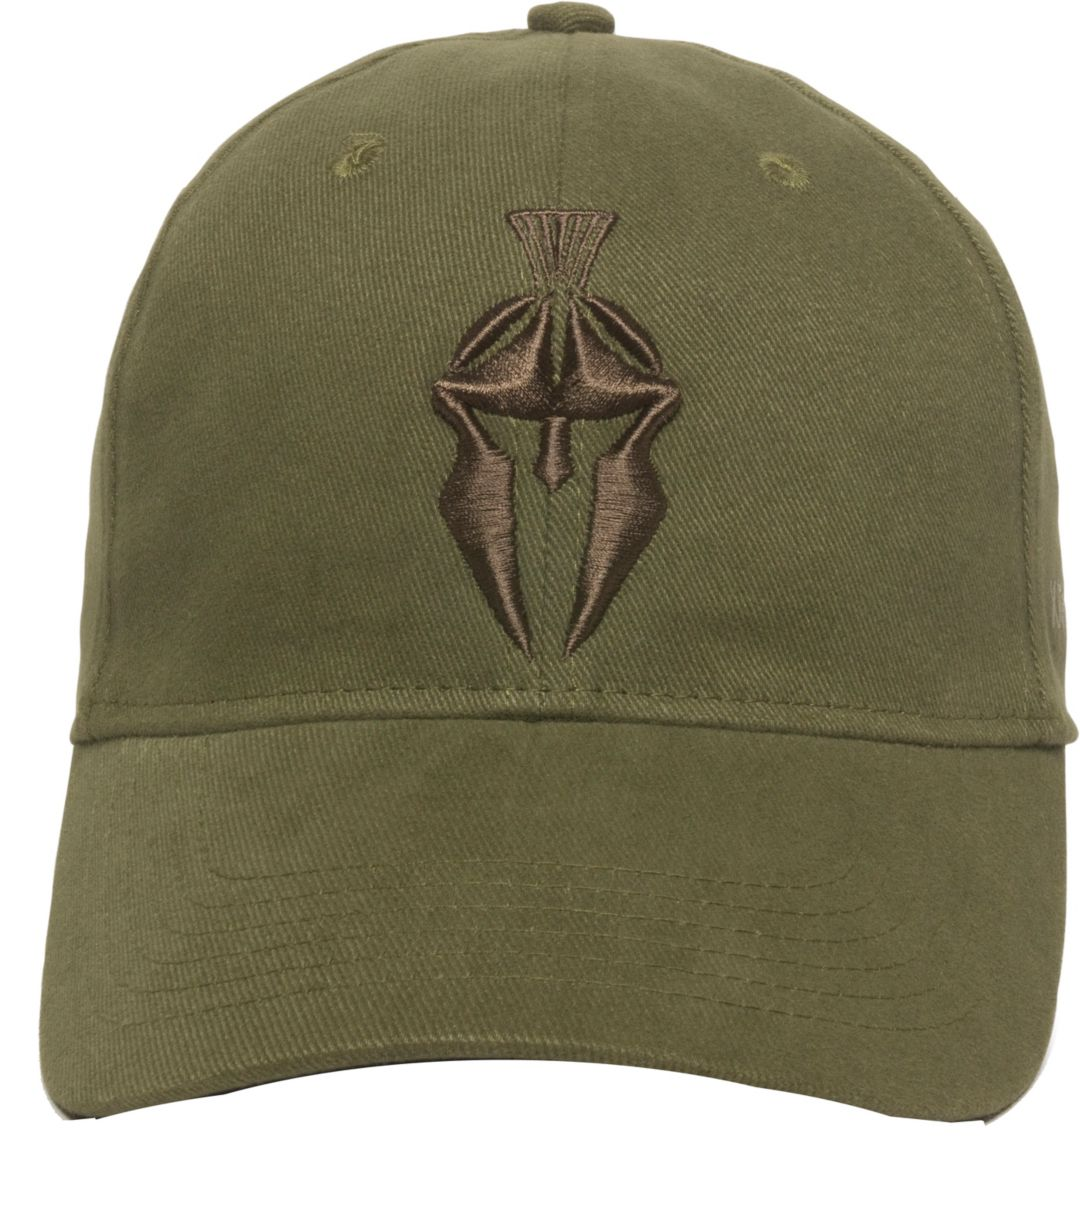 b393526a Outdoor Cap Men's Kryptek Spartan Hat | Field & Stream